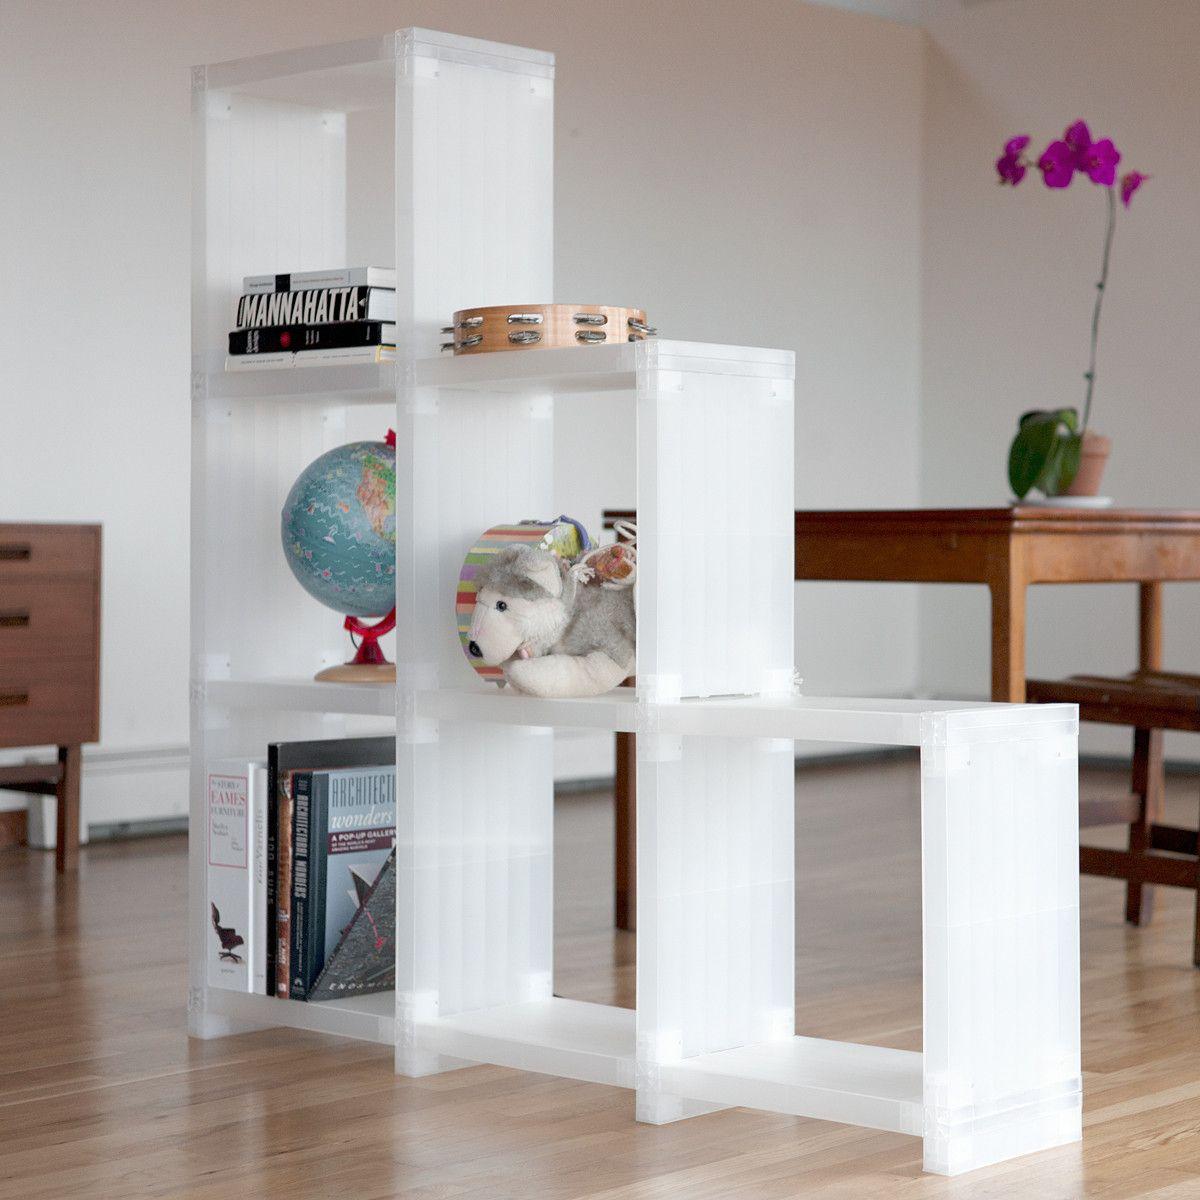 Cubitec Shelving System Clear By Cubitec Modern Home Furniture Decor Cubitec Shelving